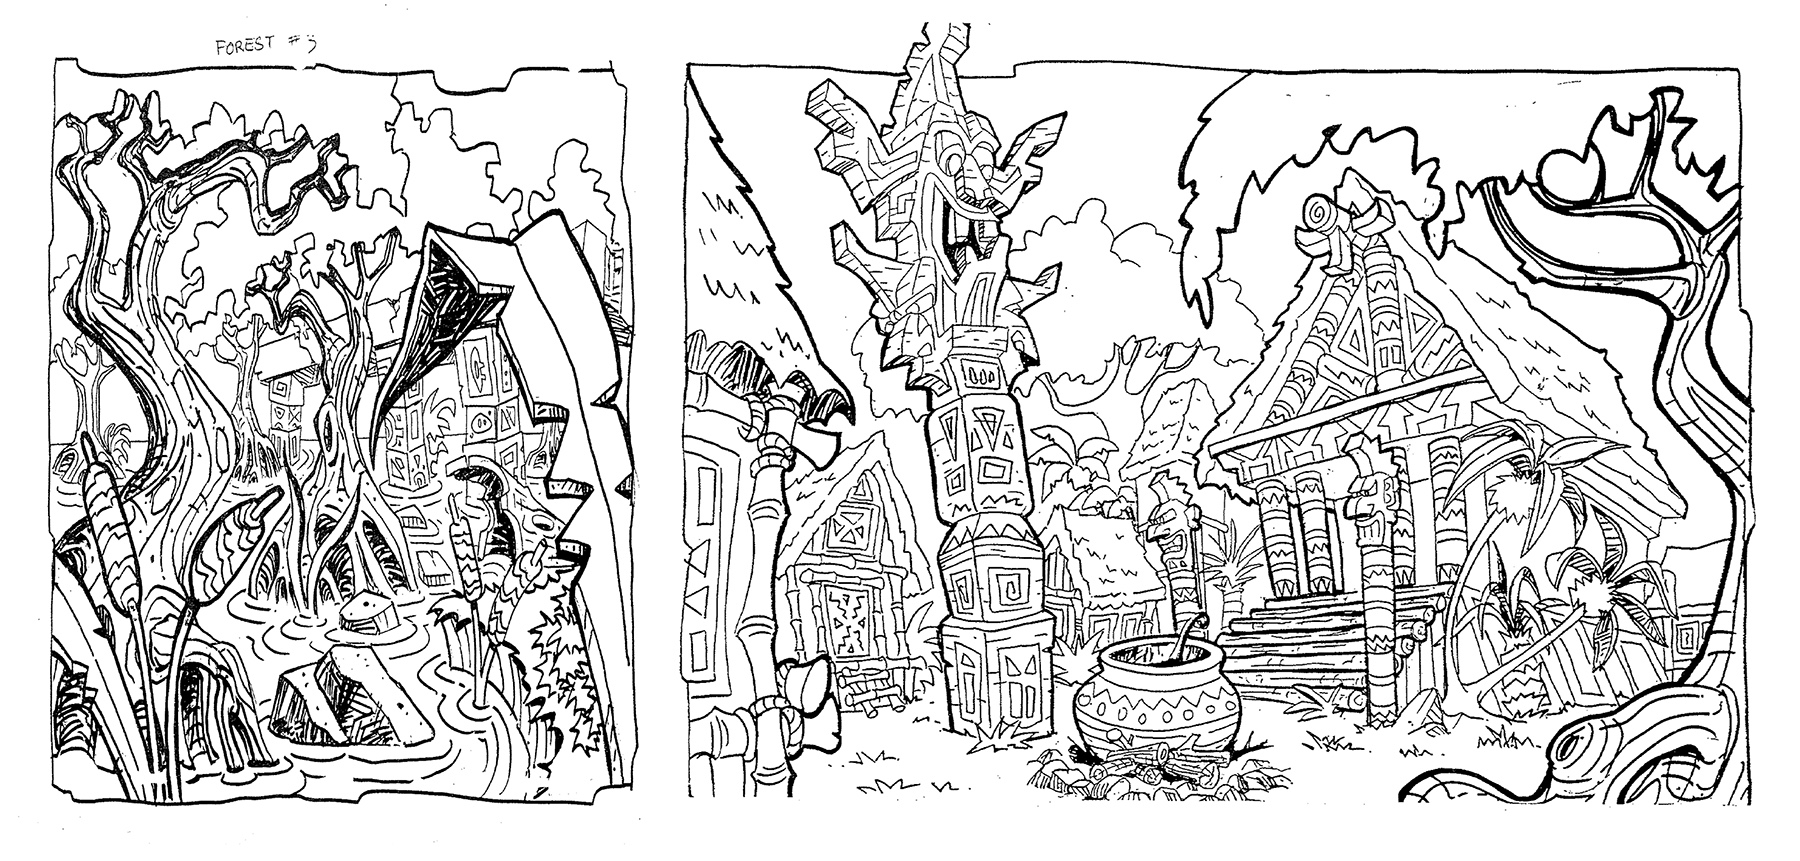 The Re Making Of Crash Bandicoot Engadget